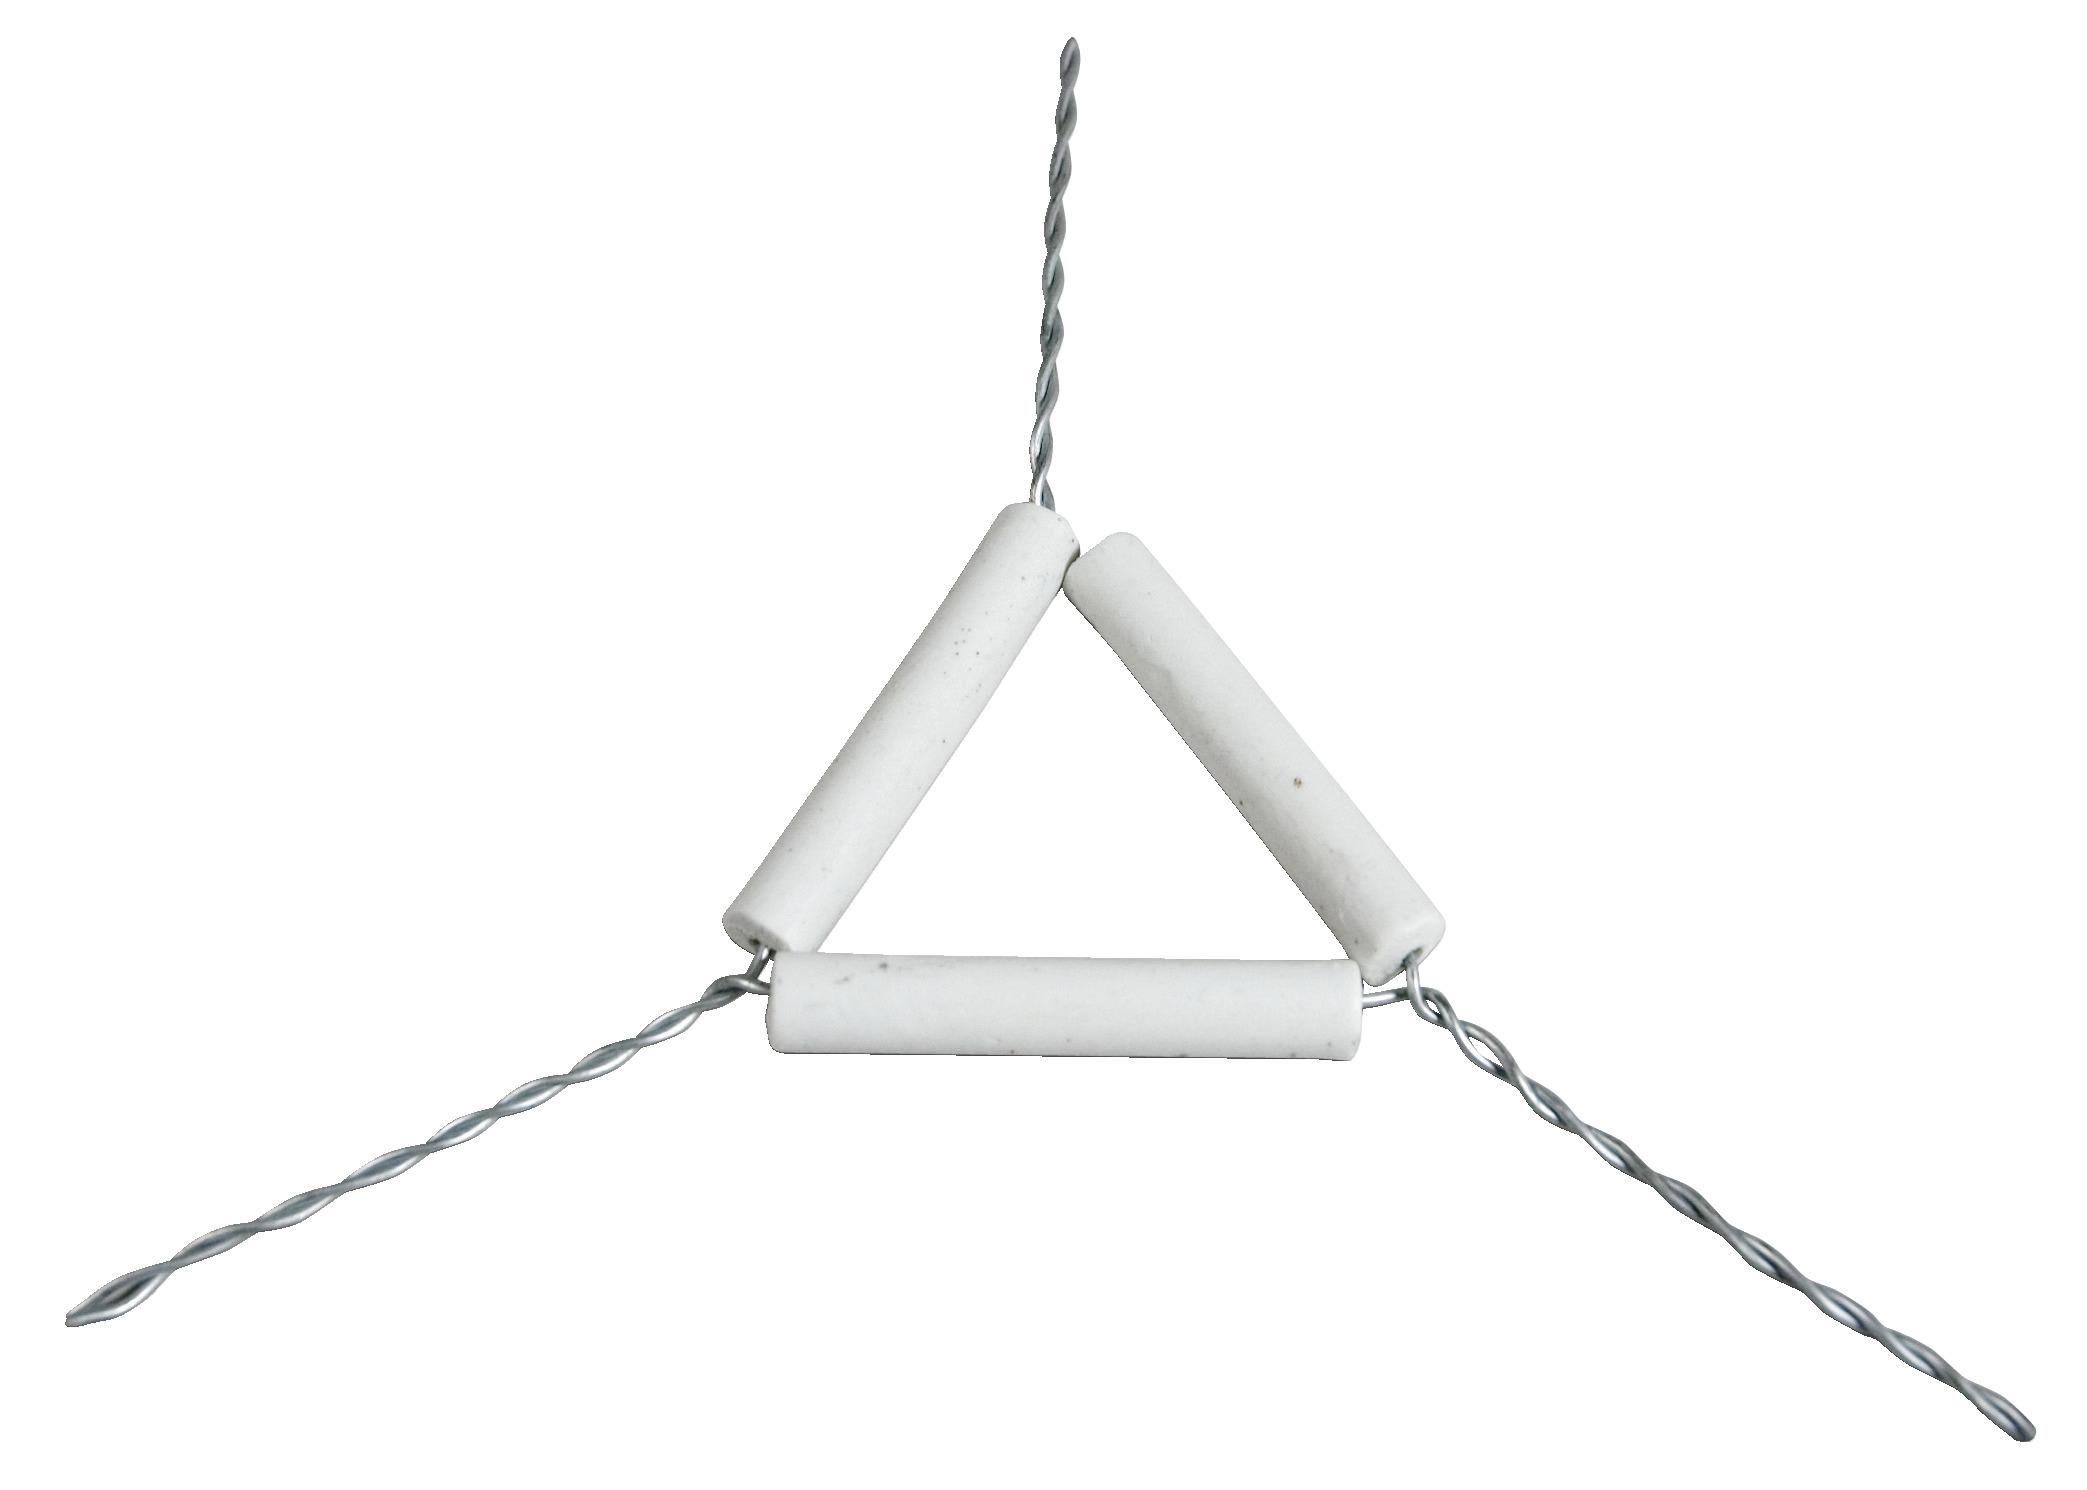 Crucible Triangle - FREY SCIENTIFIC  for Laboratory Clay Triangle  8lpfiz